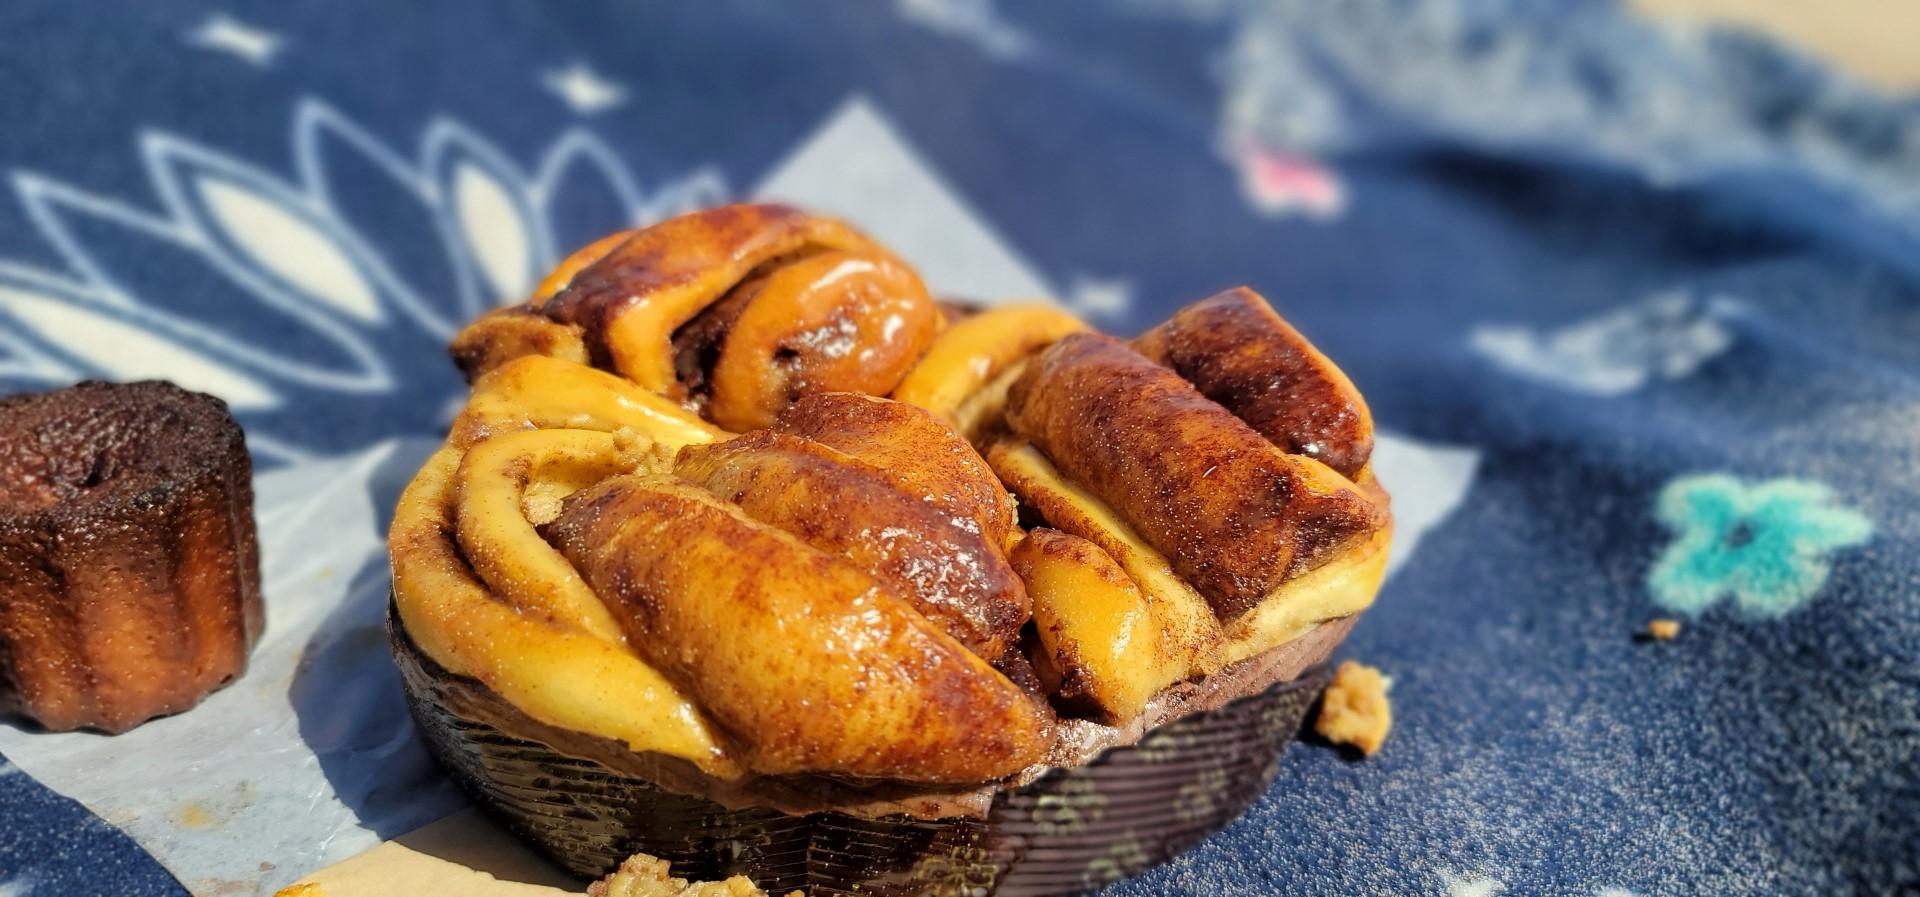 cinnabon buns on blue blanket